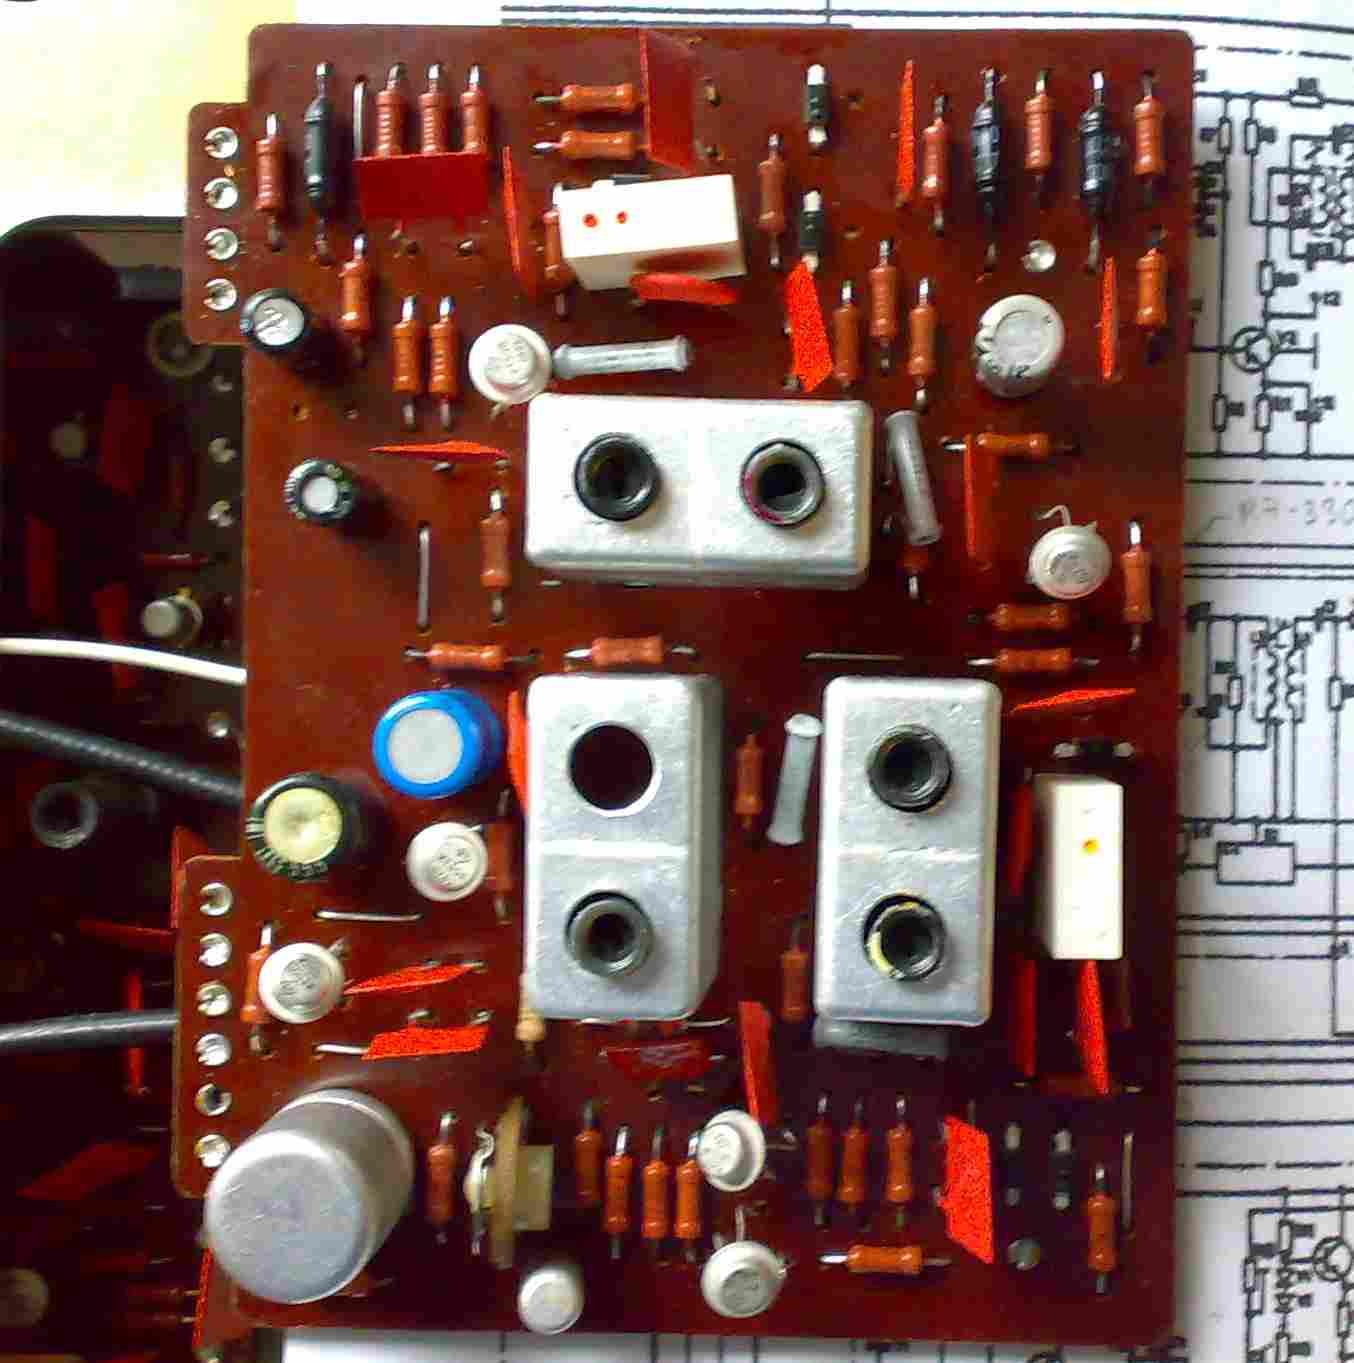 ишим 001 описание и схема радиоприемника